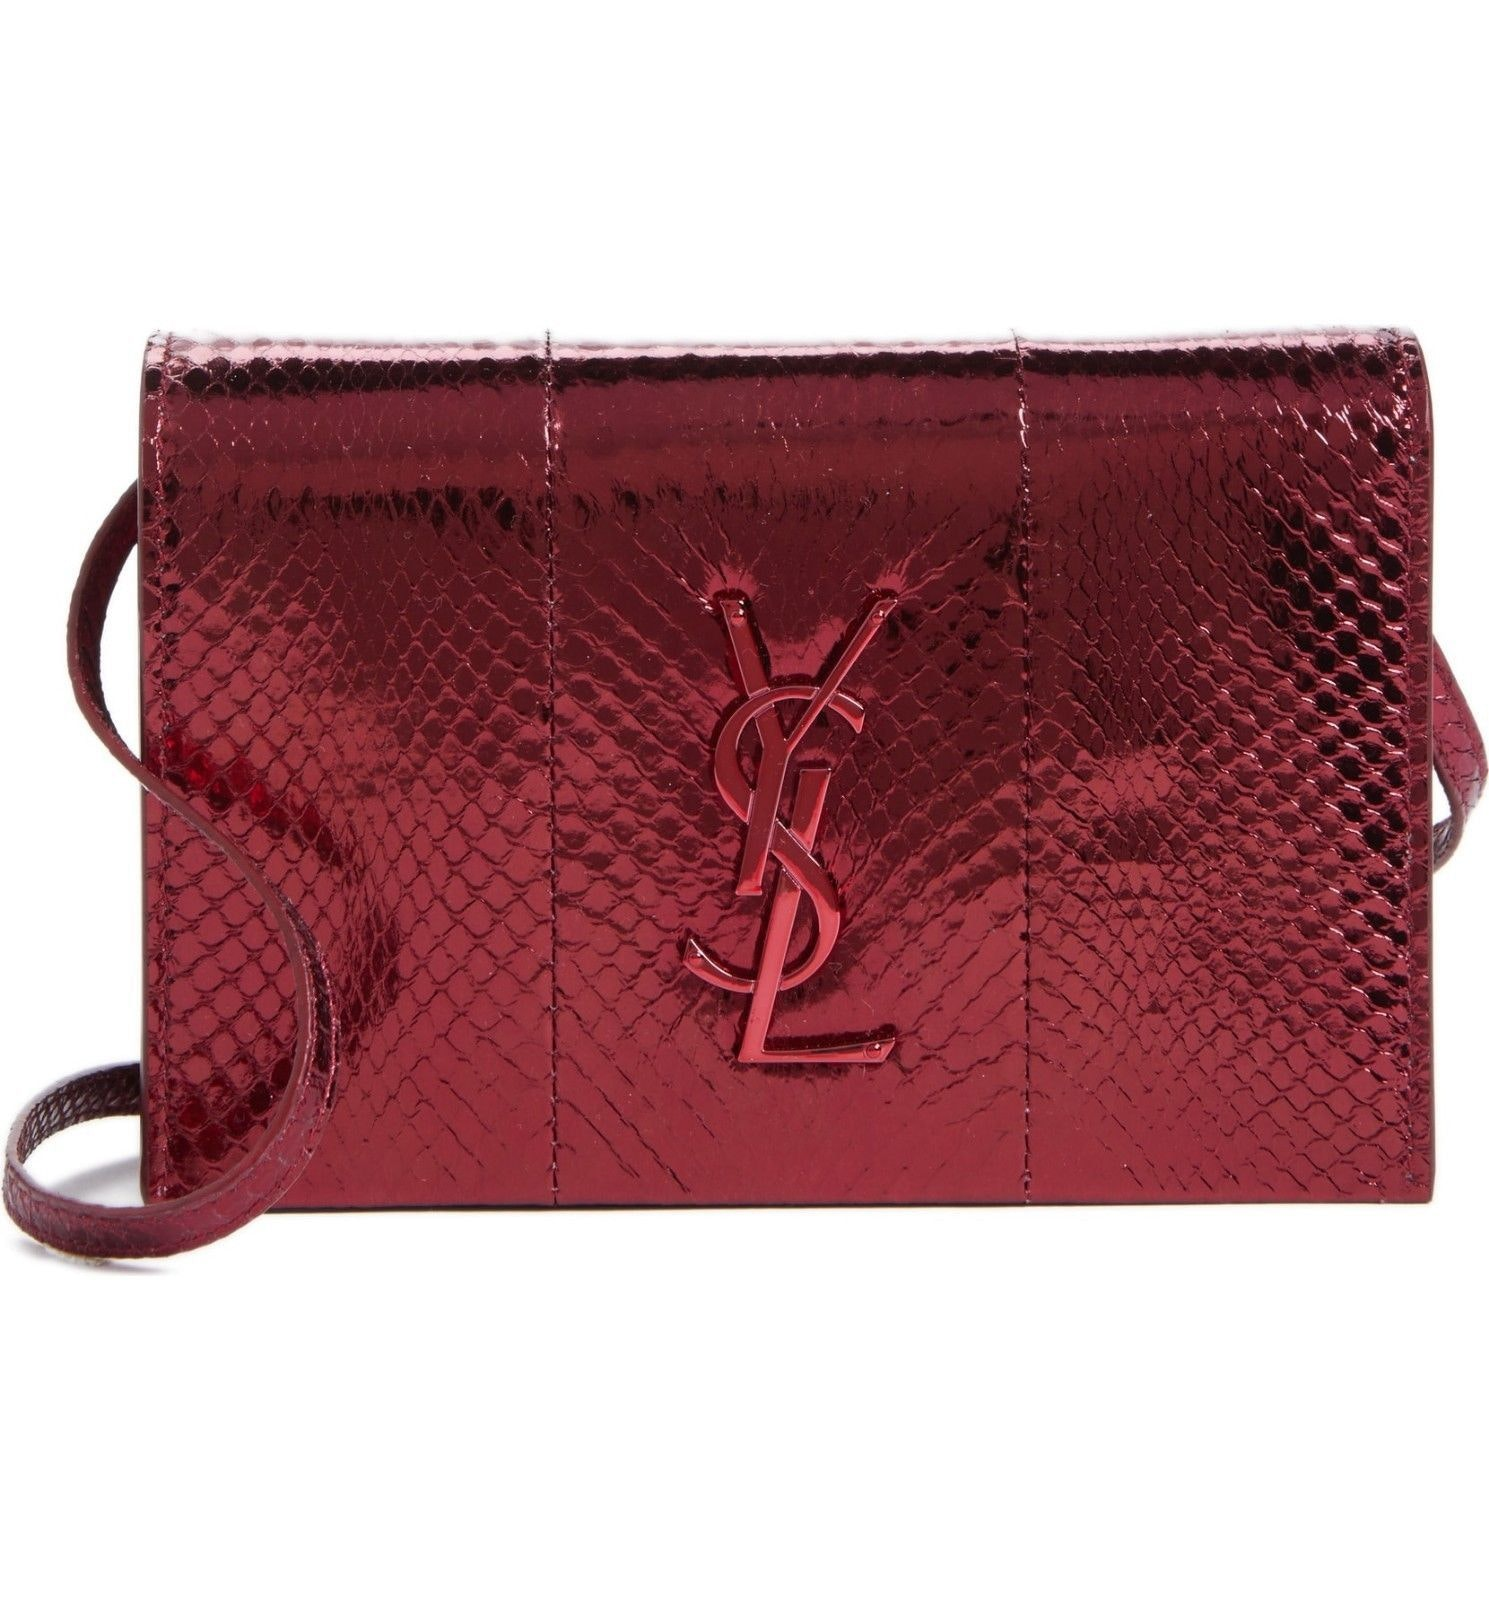 Saint Laurent Monogram Kate Toy Metallic Red